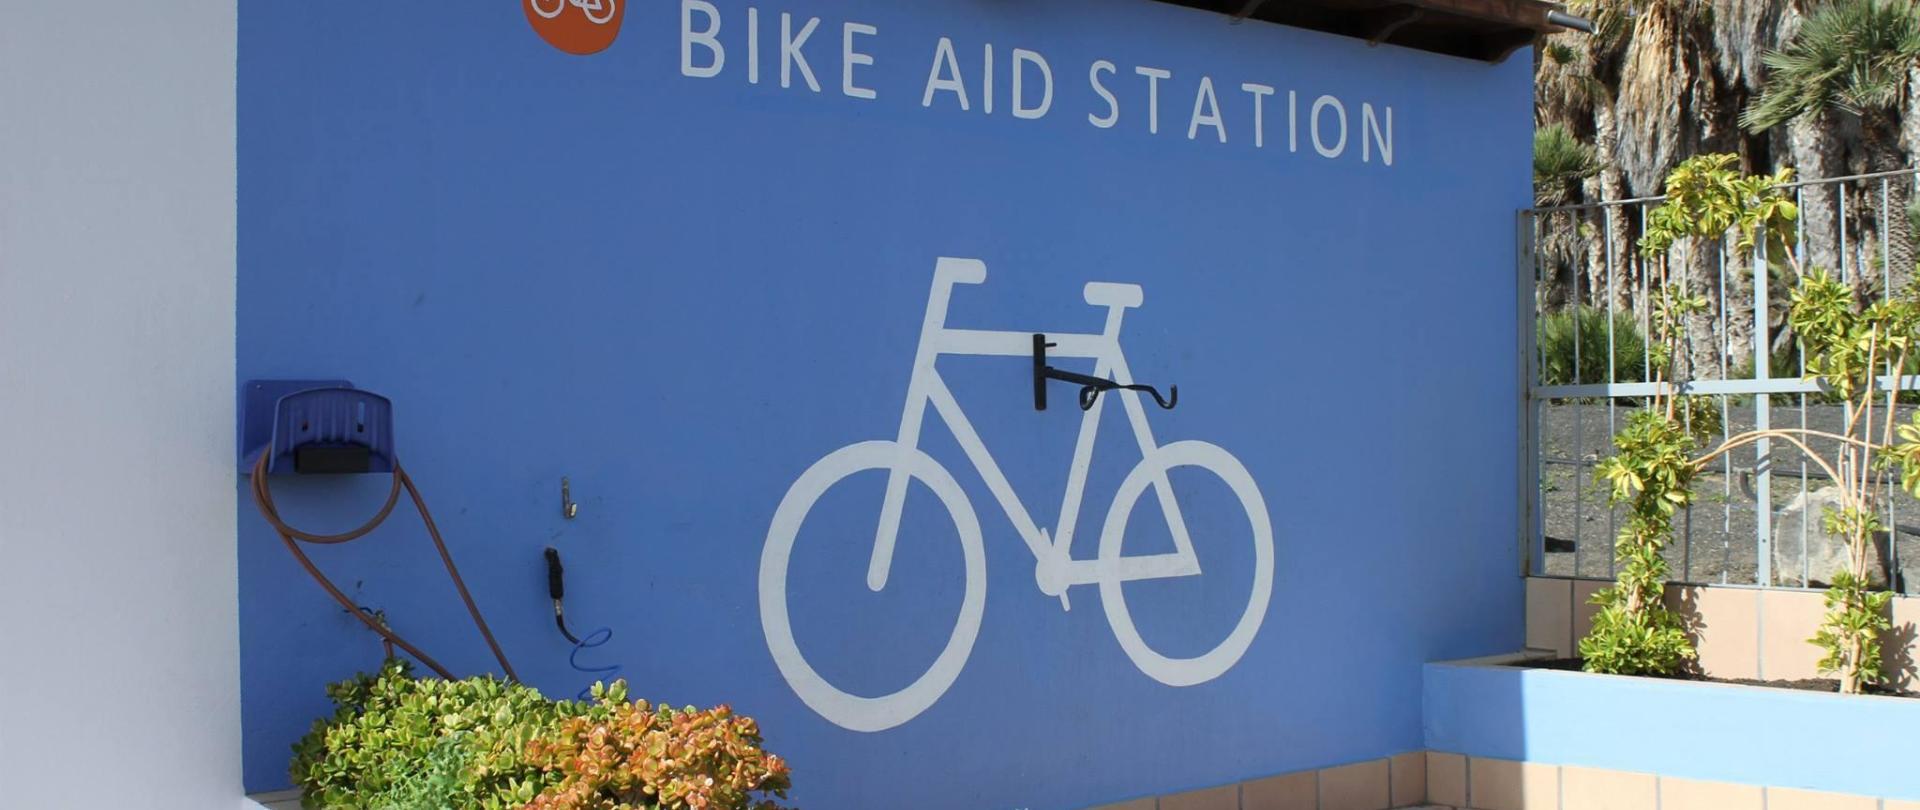 Bike Aid Station.jpg